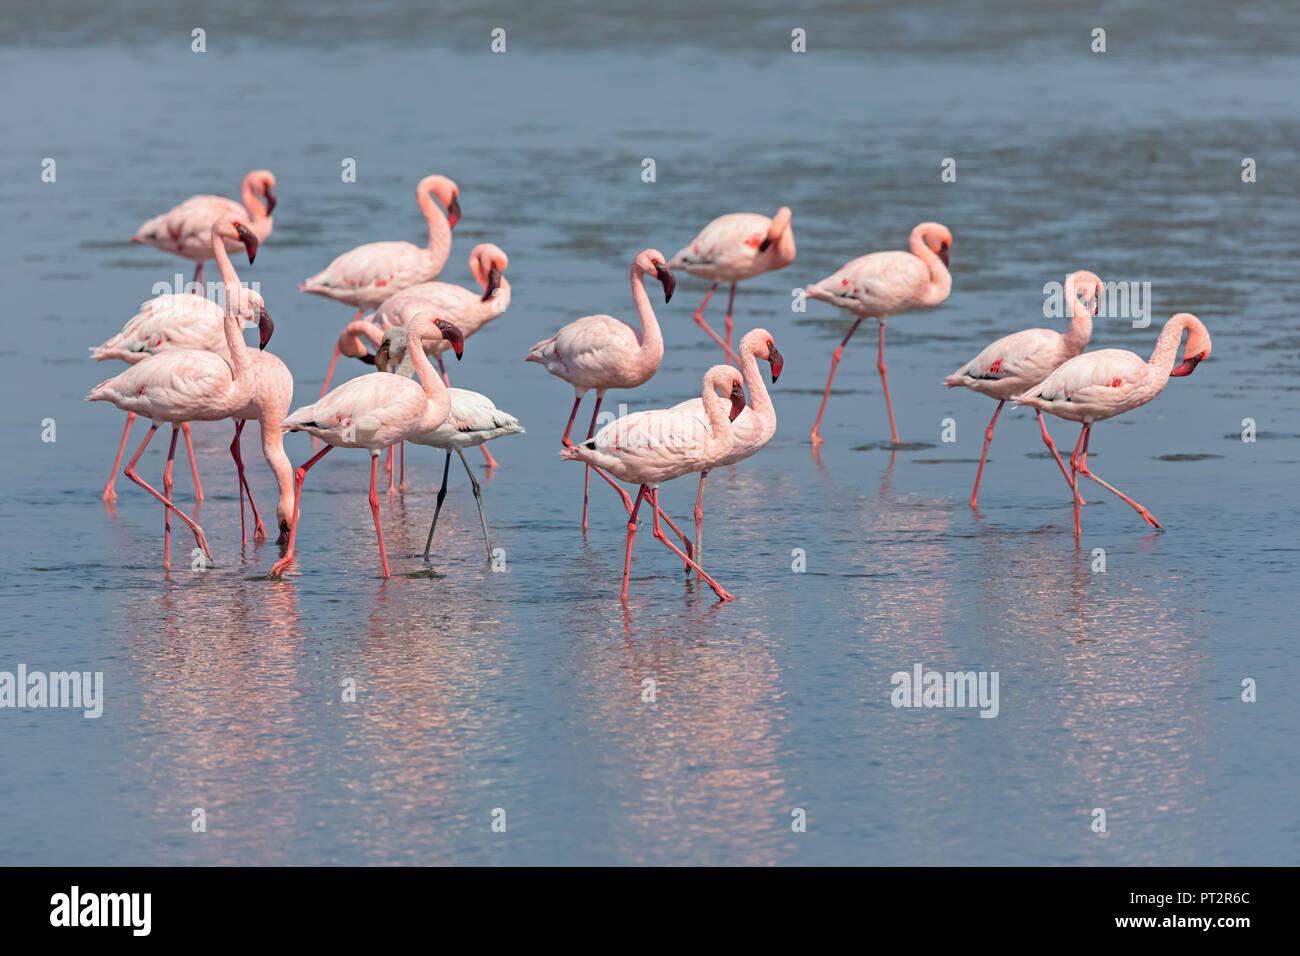 Namibia, Walvis Bay, flock of American flamingos and one Lesser flamingo Stock Photo